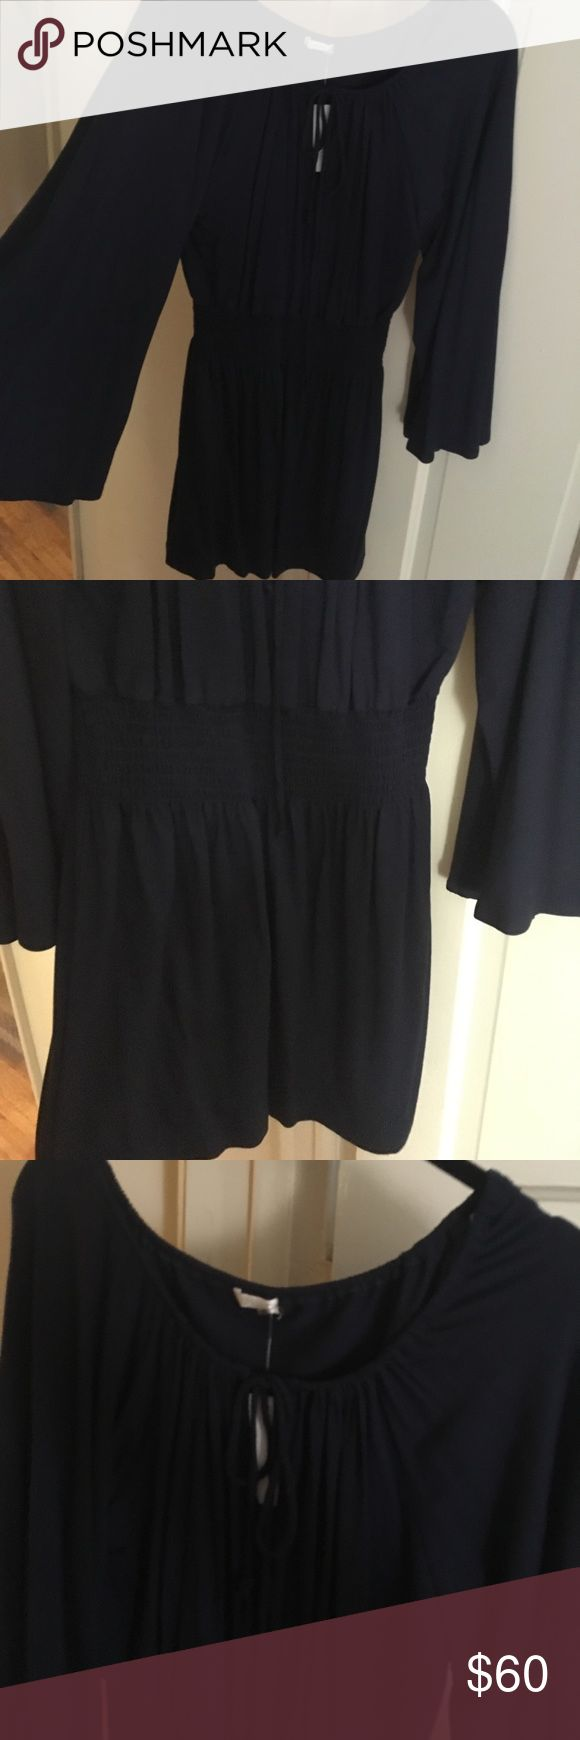 Navy Mini Dress / Navy / Size Medium Navy Mini Dress / Navy / Size Medium / Off-Shoulder Option / Bell Sleeves / New / Never Been Worn - Purchased on Shopbop tart Dresses Mini